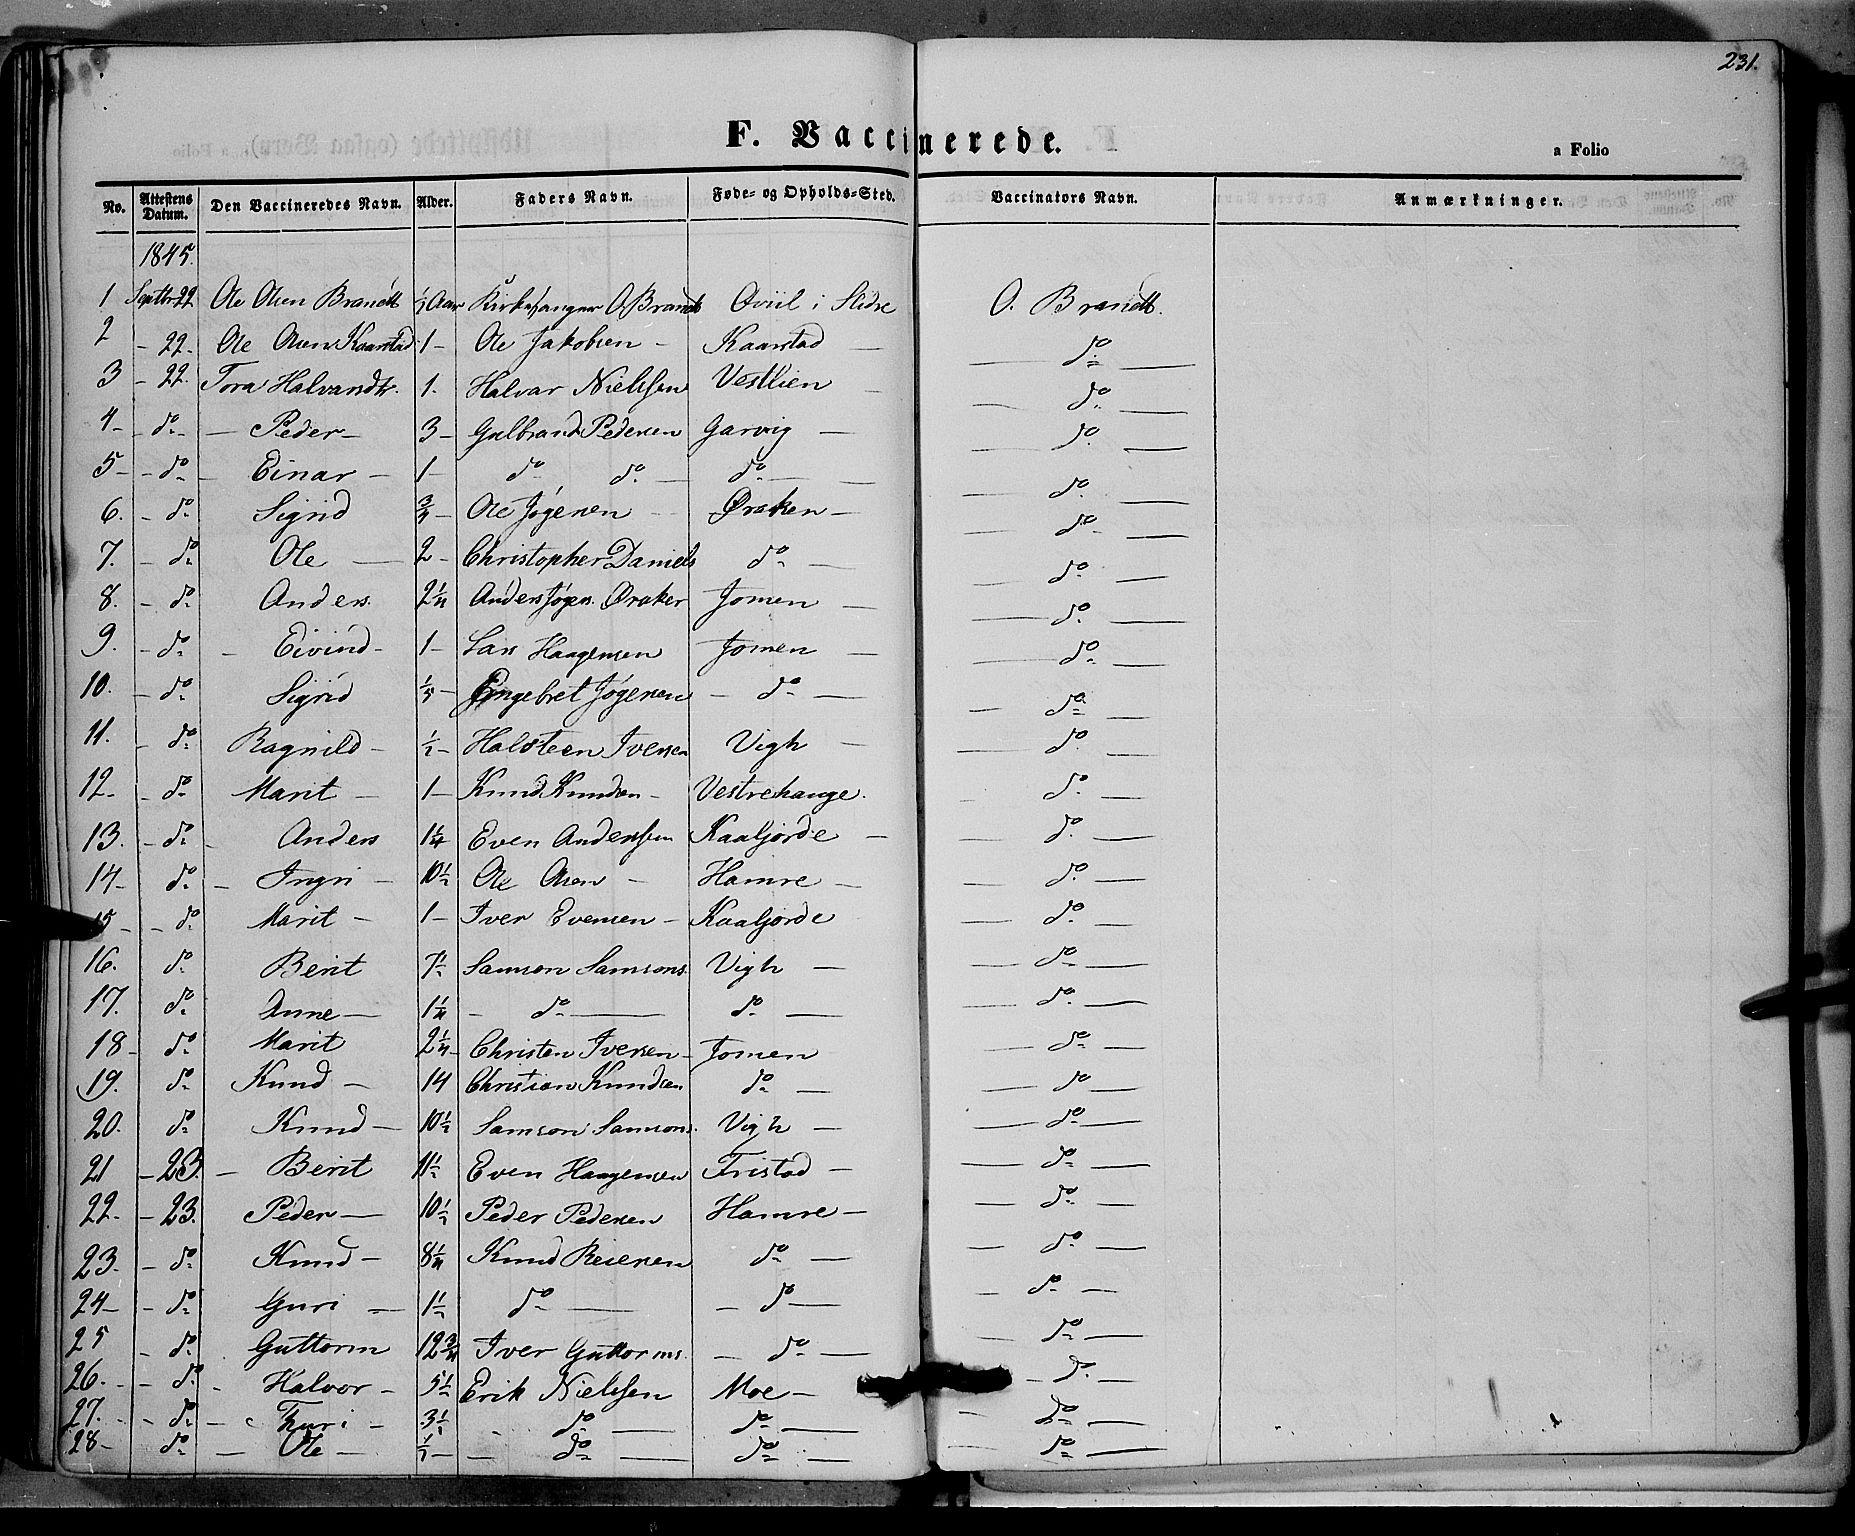 SAH, Vestre Slidre prestekontor, Ministerialbok nr. 1, 1844-1855, s. 231